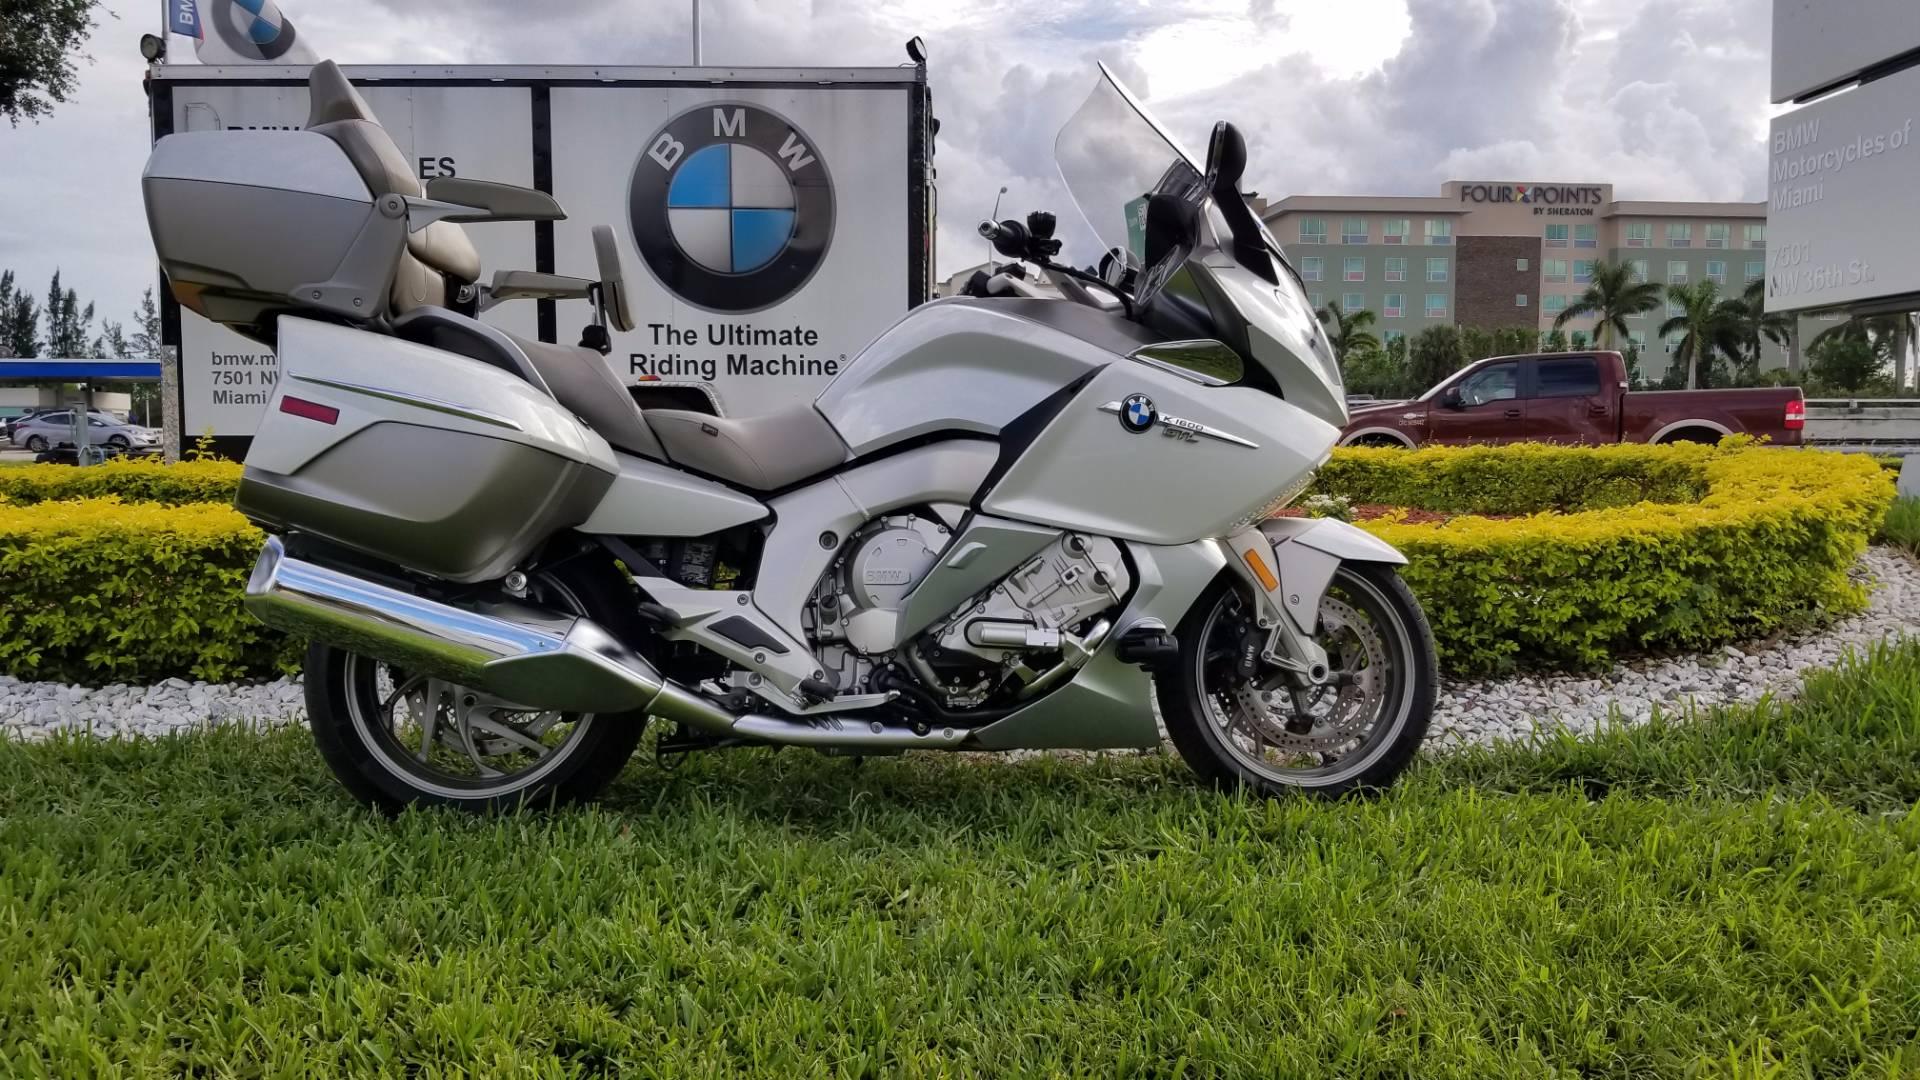 2014 K 1600 GTL Exclusive